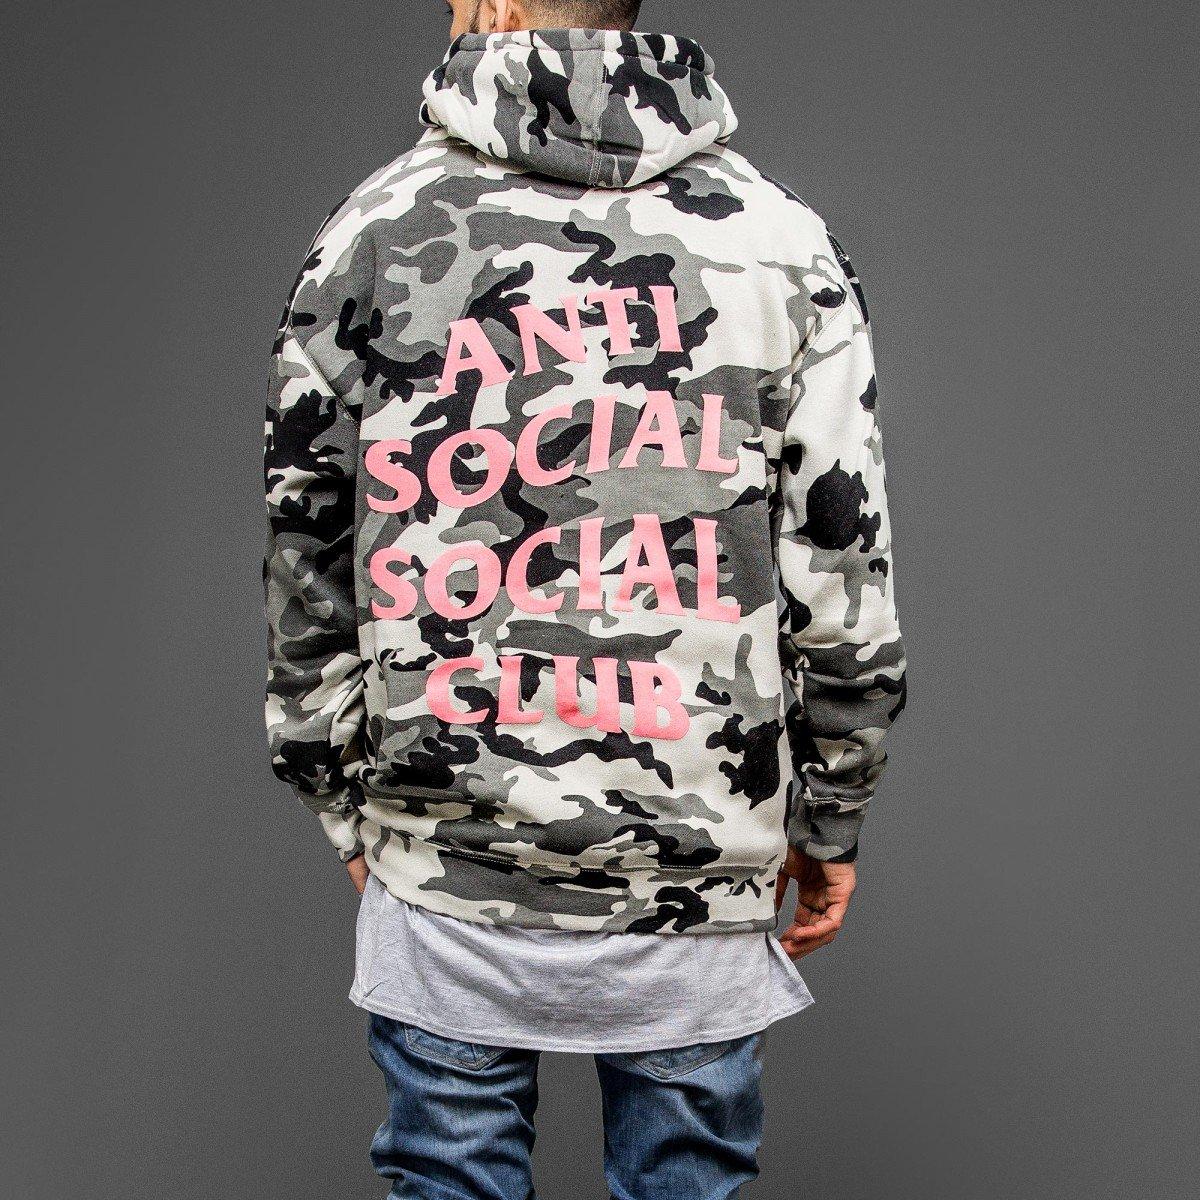 a23be117cab0 Kardiance Snow Camo Anti Social Social Club ASSC Hoodie Hoody   Amazon.co.uk  Clothing